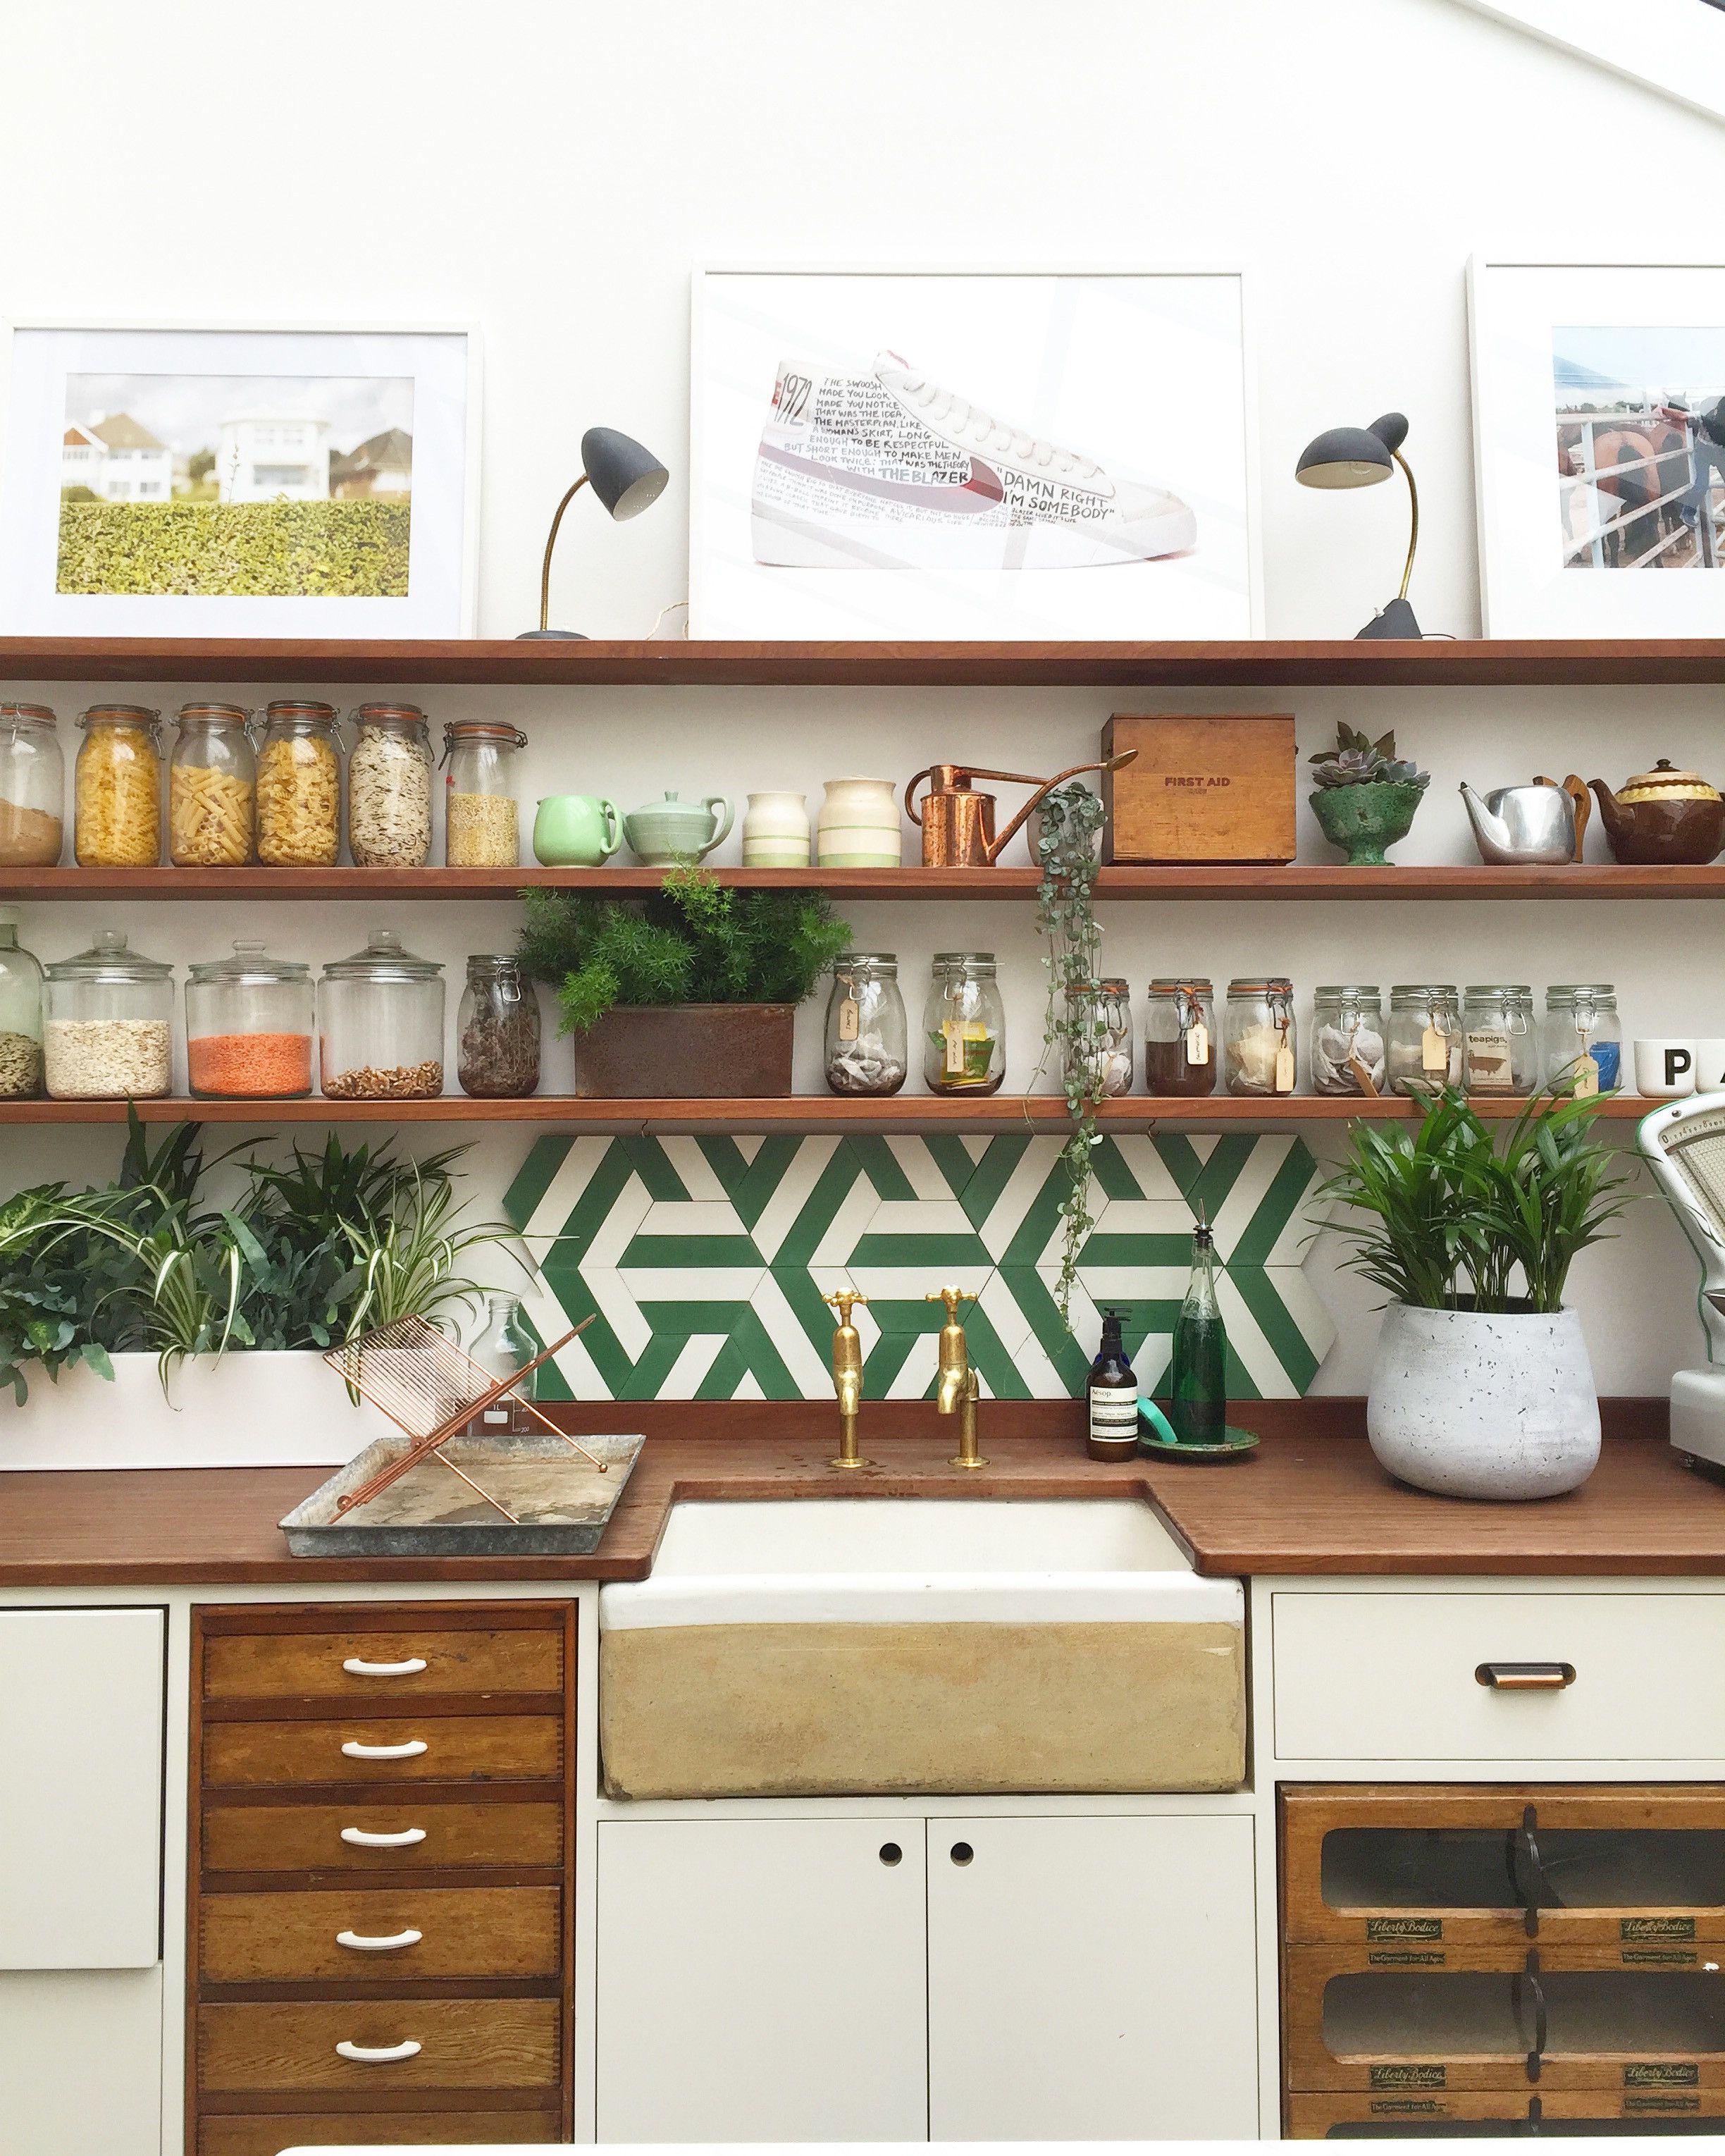 kimono-b---pure-whitepea-green----papermill-studios-uk(2).JPG (2448 ...